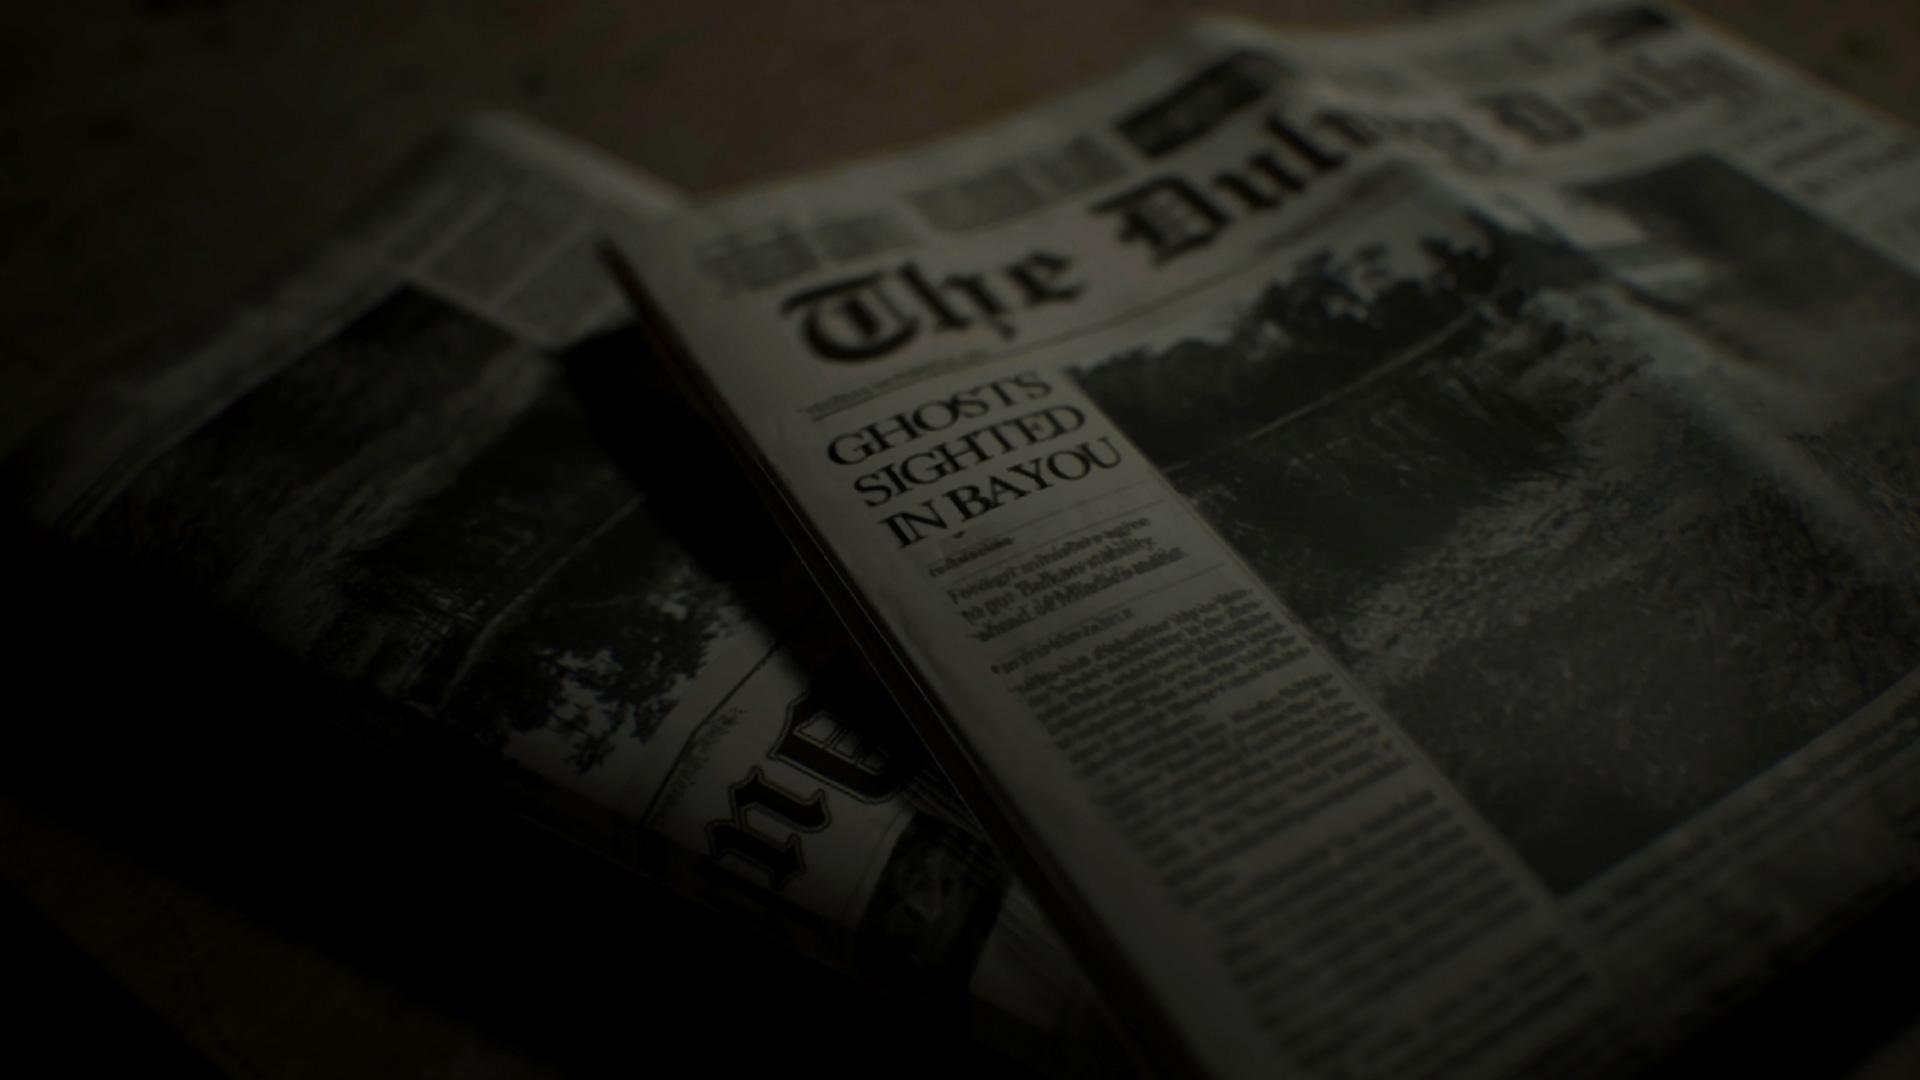 Fichier:Resident Evil 7 - Ghost Sighting newspaper.jpg